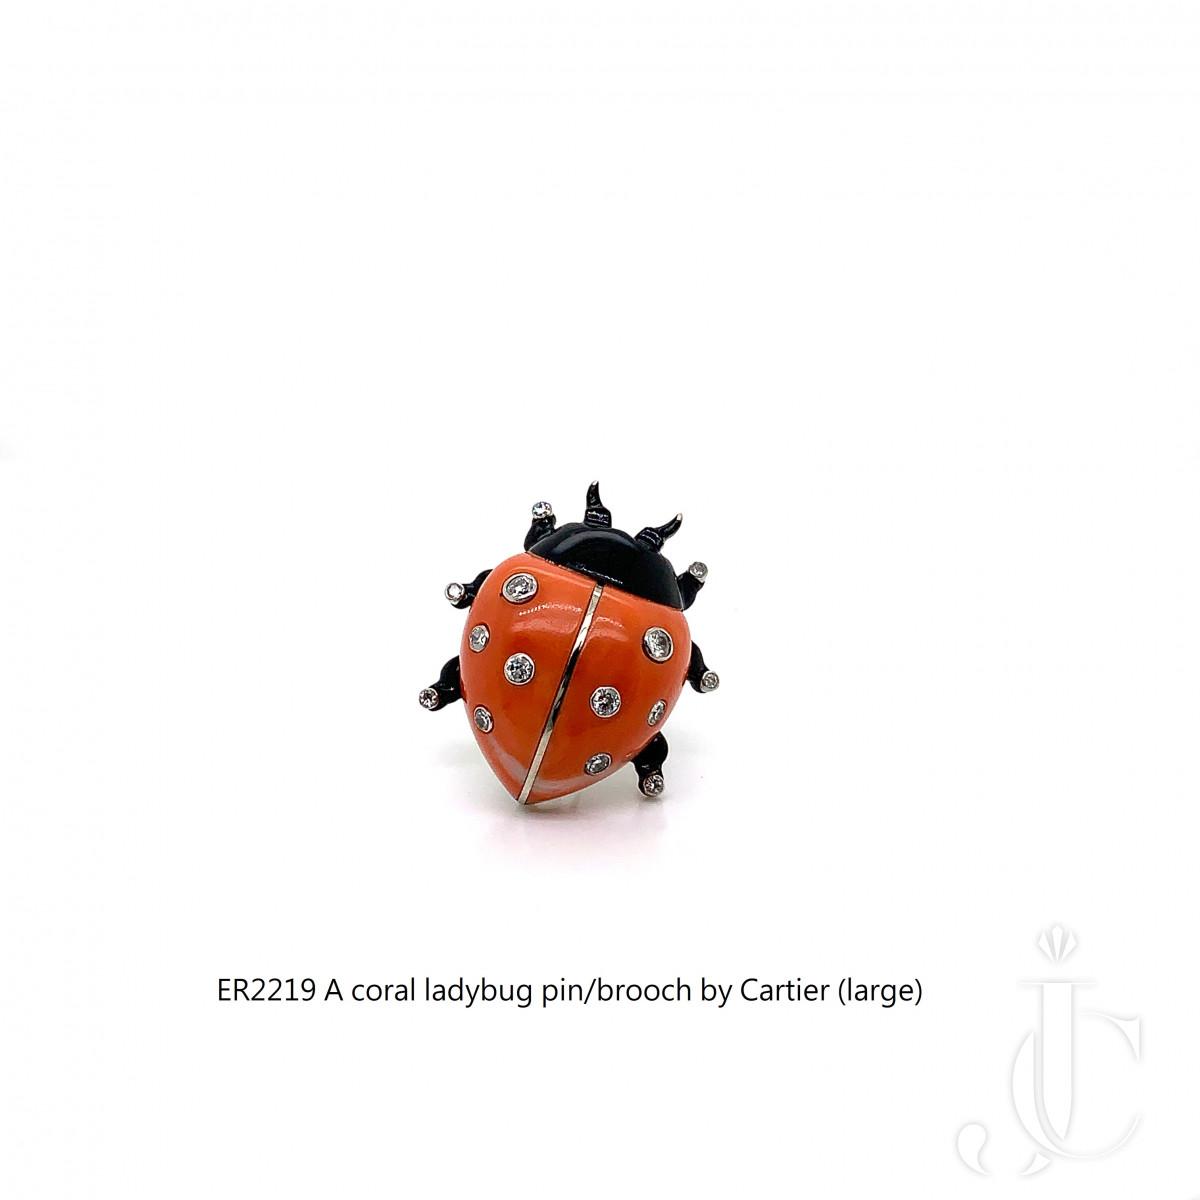 A platinum coral ladybug pinbrooch by Cartier